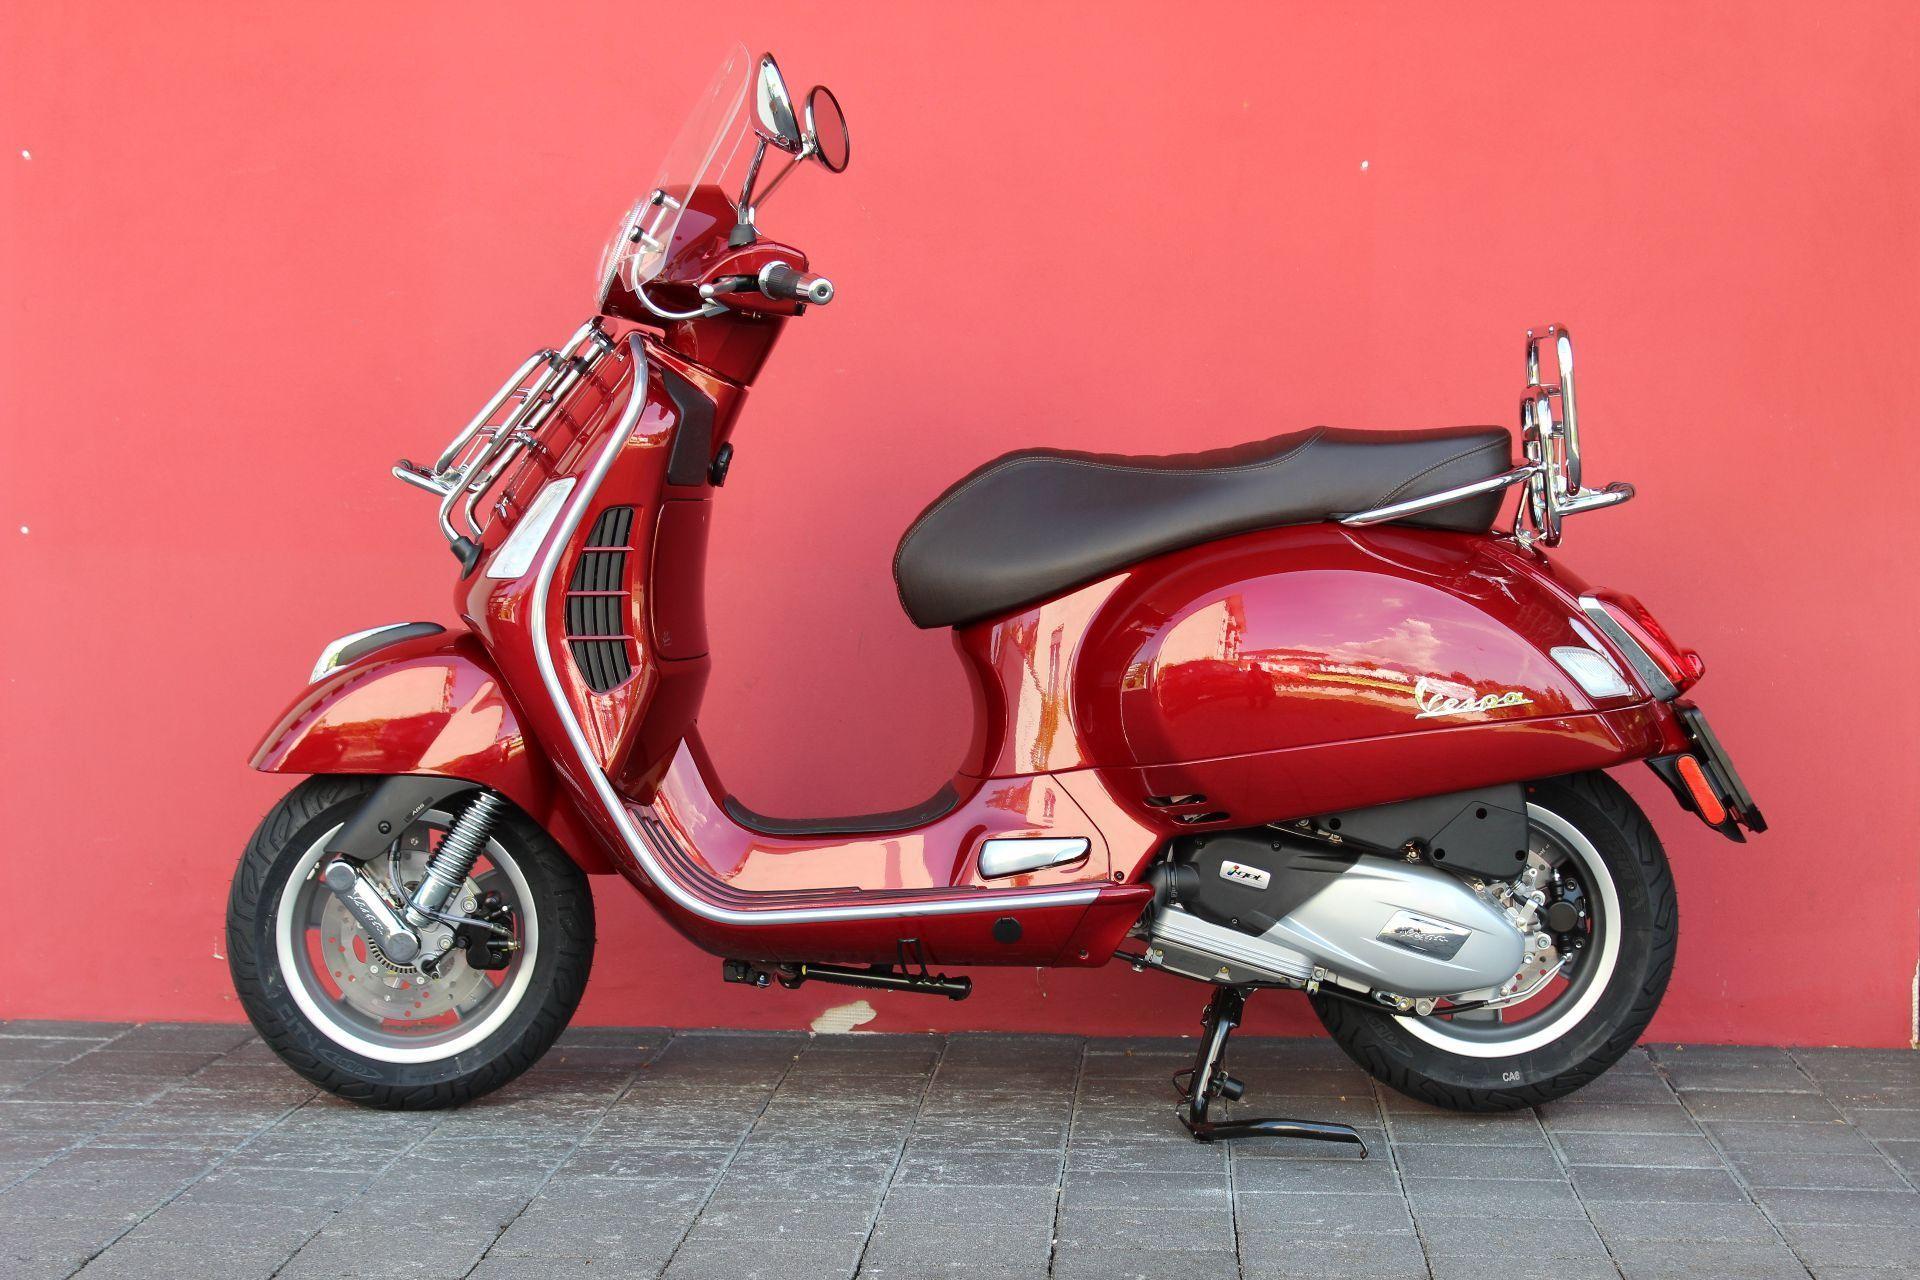 https://www.motorradhandel-schweiz.ch/kunden_occasionen/365/J388892-PIAGGIO-Vespa-GTS-300-Super.jpg